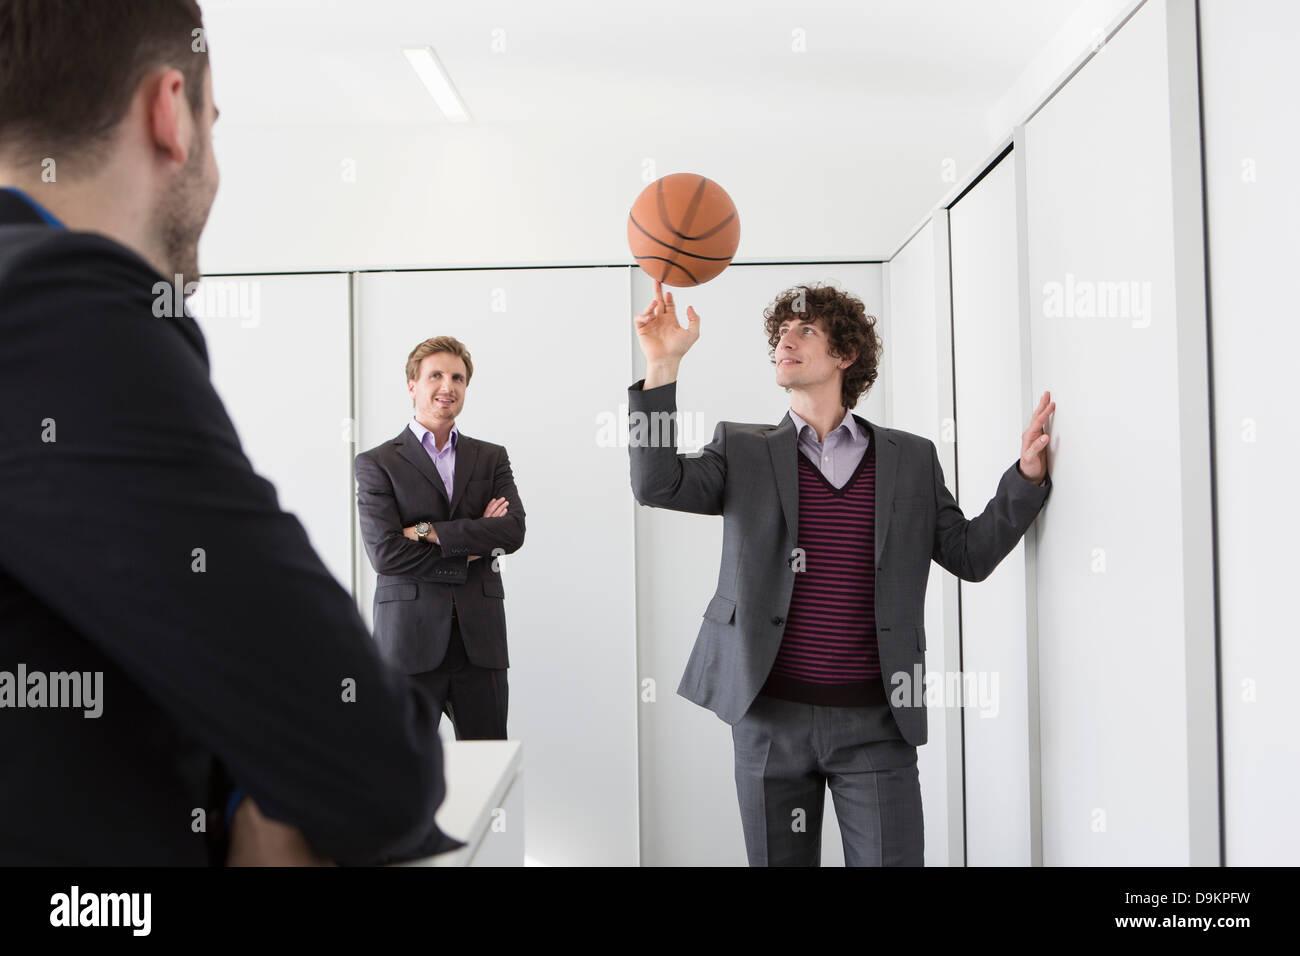 Trabajador de oficina girando sobre la palanquita de baloncesto Imagen De Stock